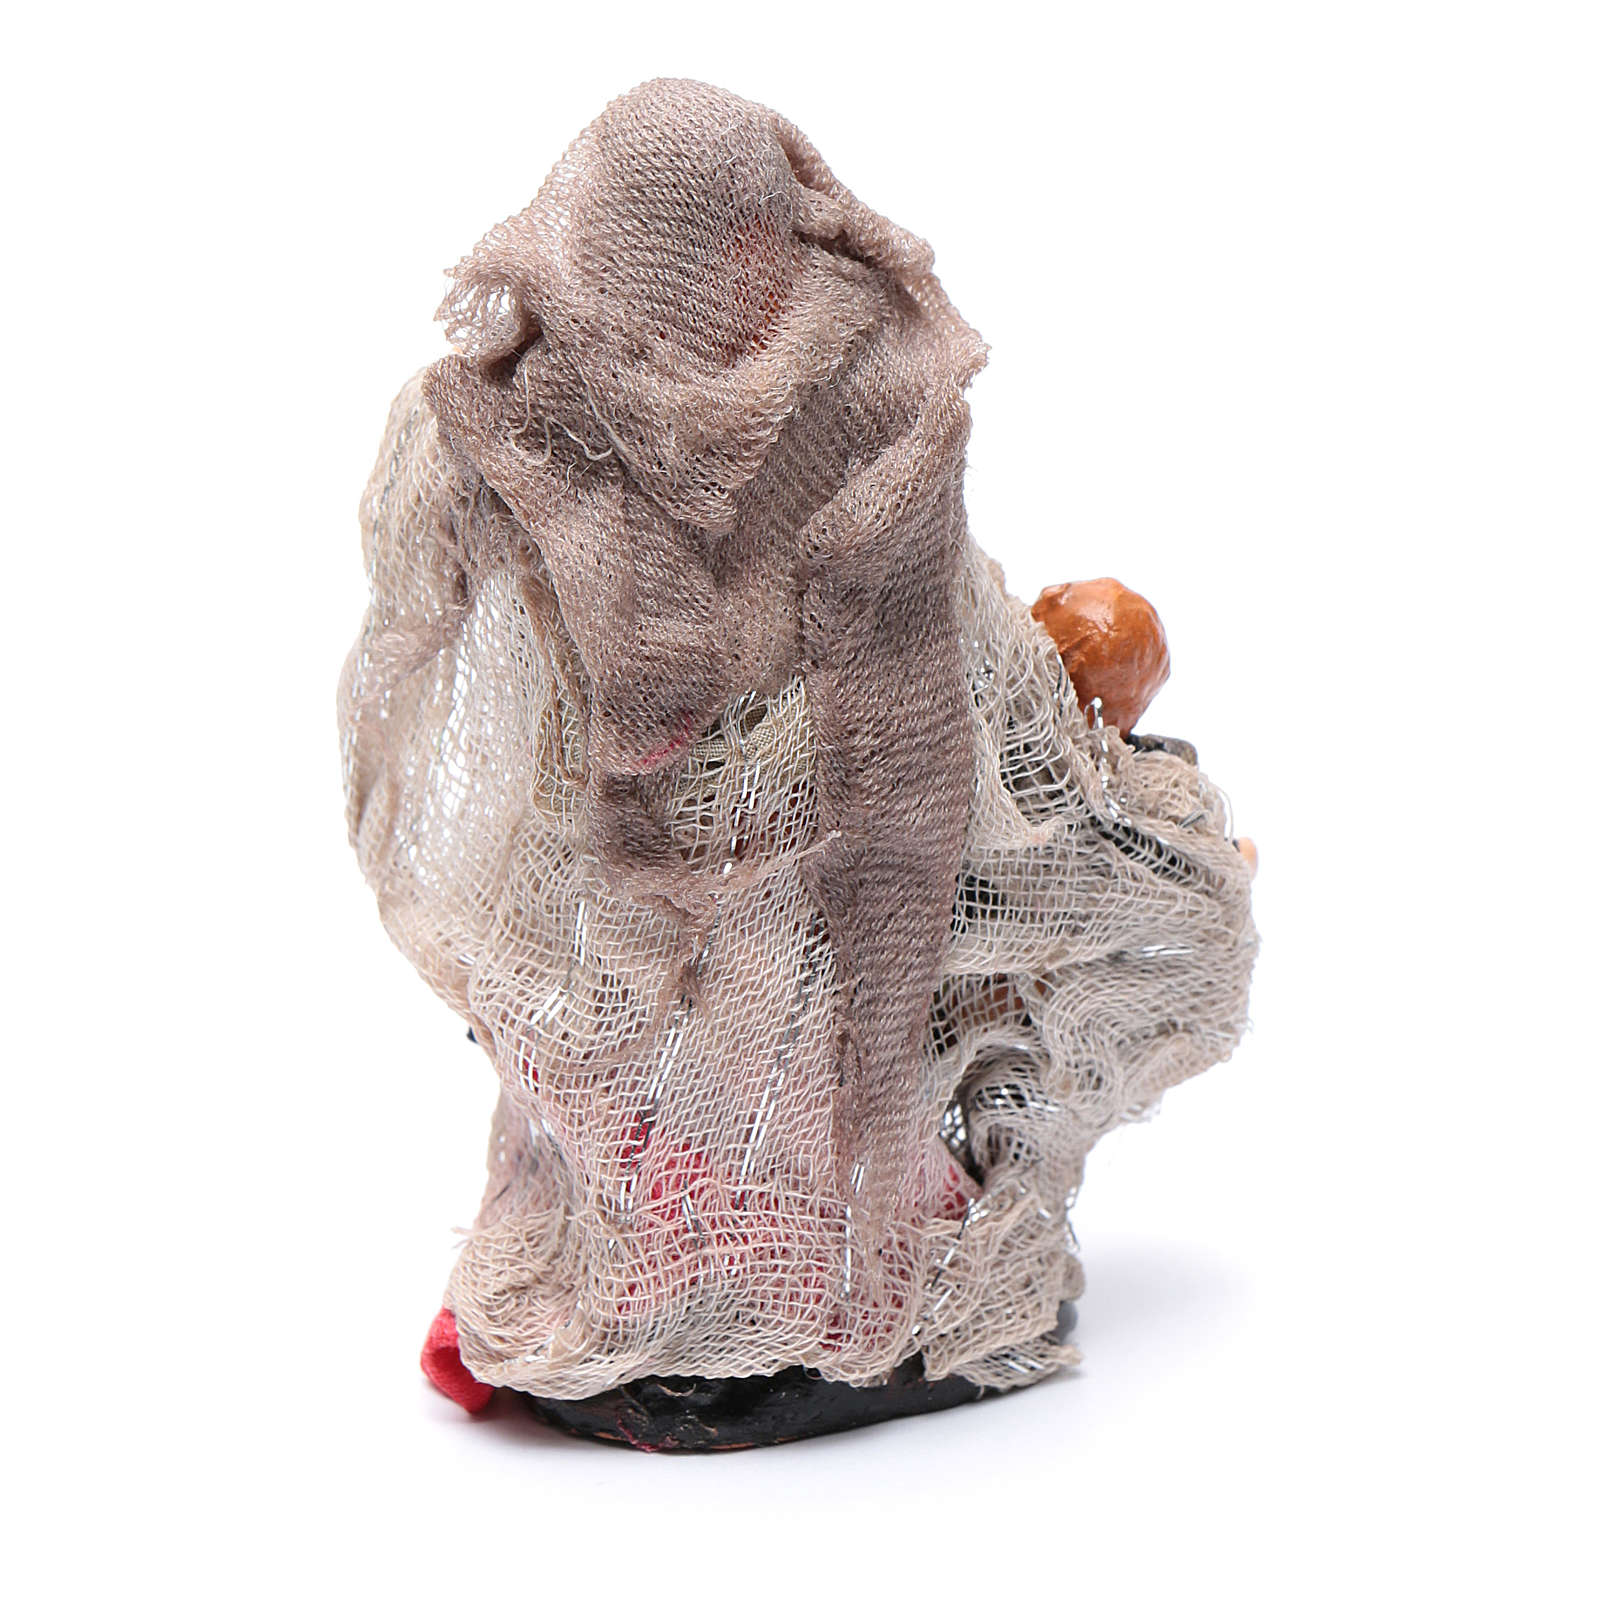 Neapolitan Nativity figurine, Woman with child 8cm 4